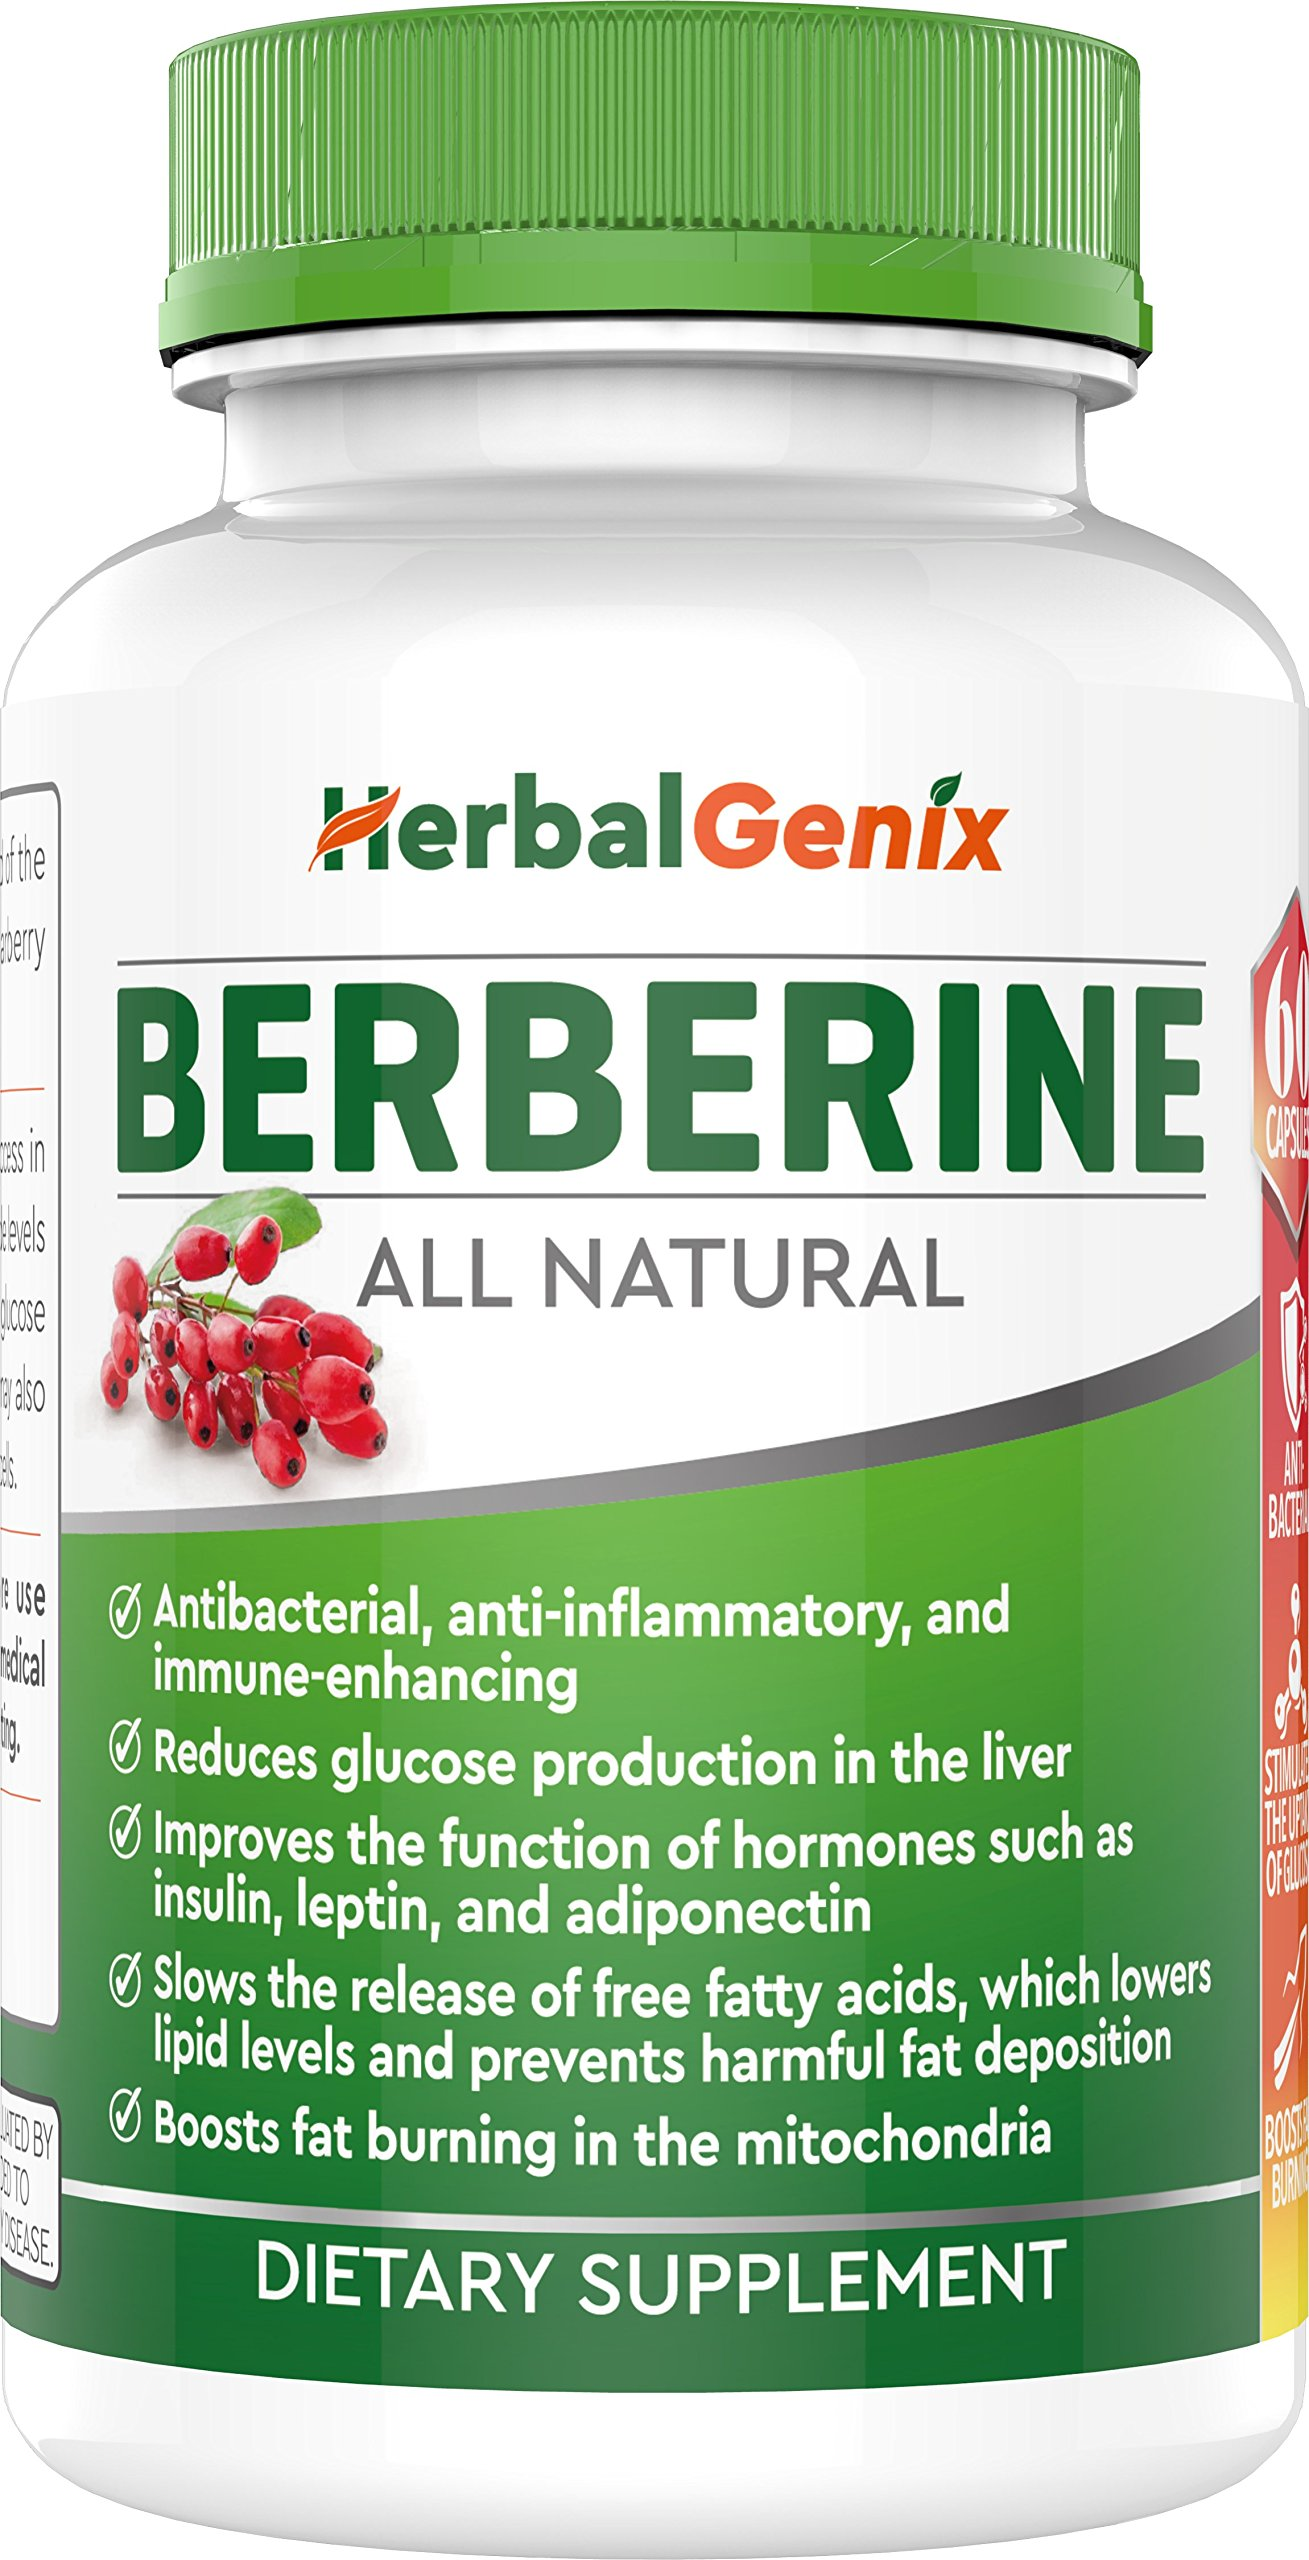 Lower Cholesterol, Triglyceride, Weight & Lower Blood Sugar with HerbalGenix Berberine 500mg HCL Supplement. All Natural Ingredients. Antioxidant, AMPK Supplement. Non-GMO/Gluten Free/Vegan Caps